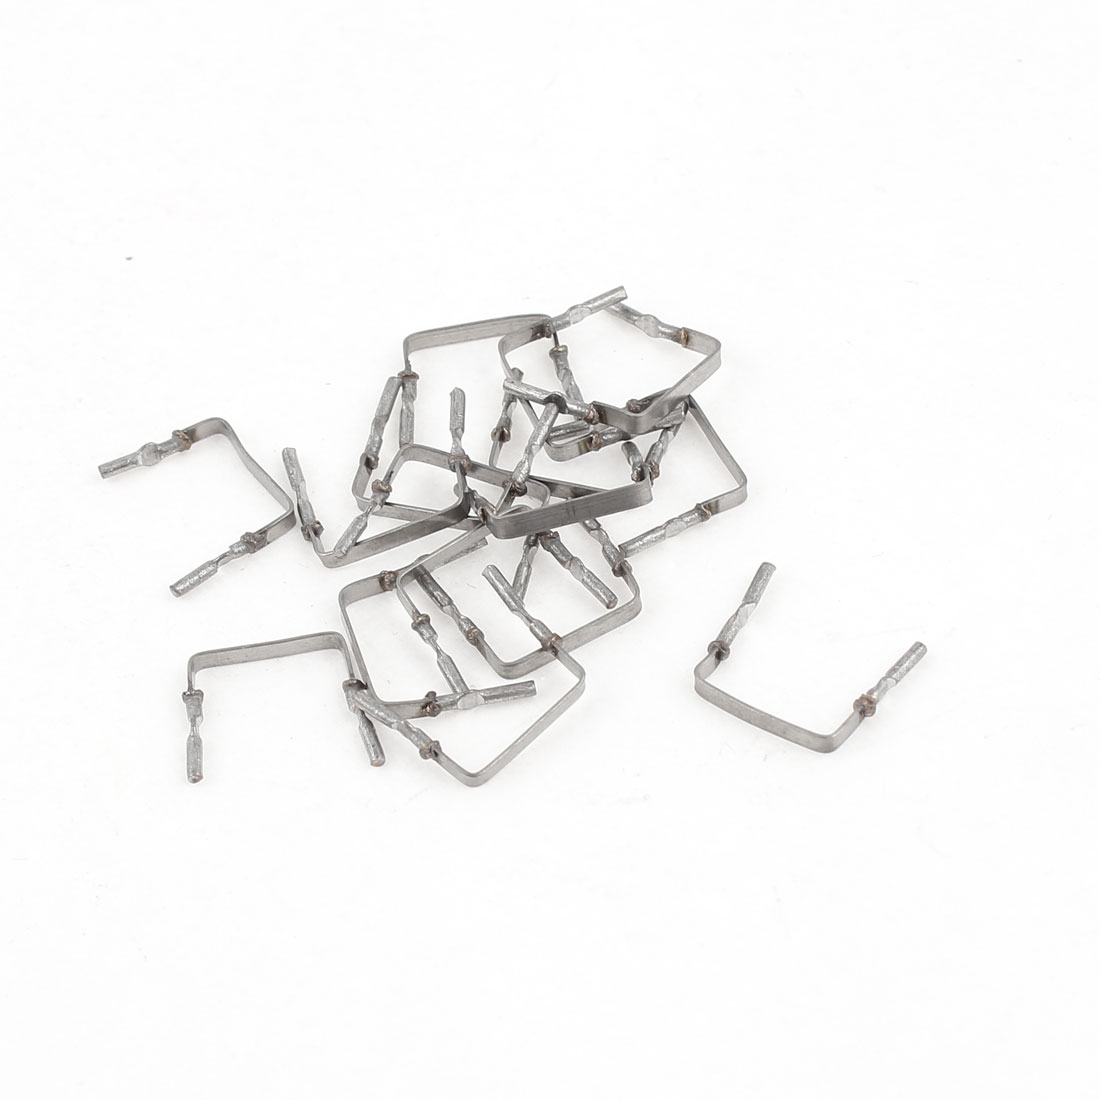 16 Pcs Resistive Resistor Current Sense 0.05Ohm 3W 1%